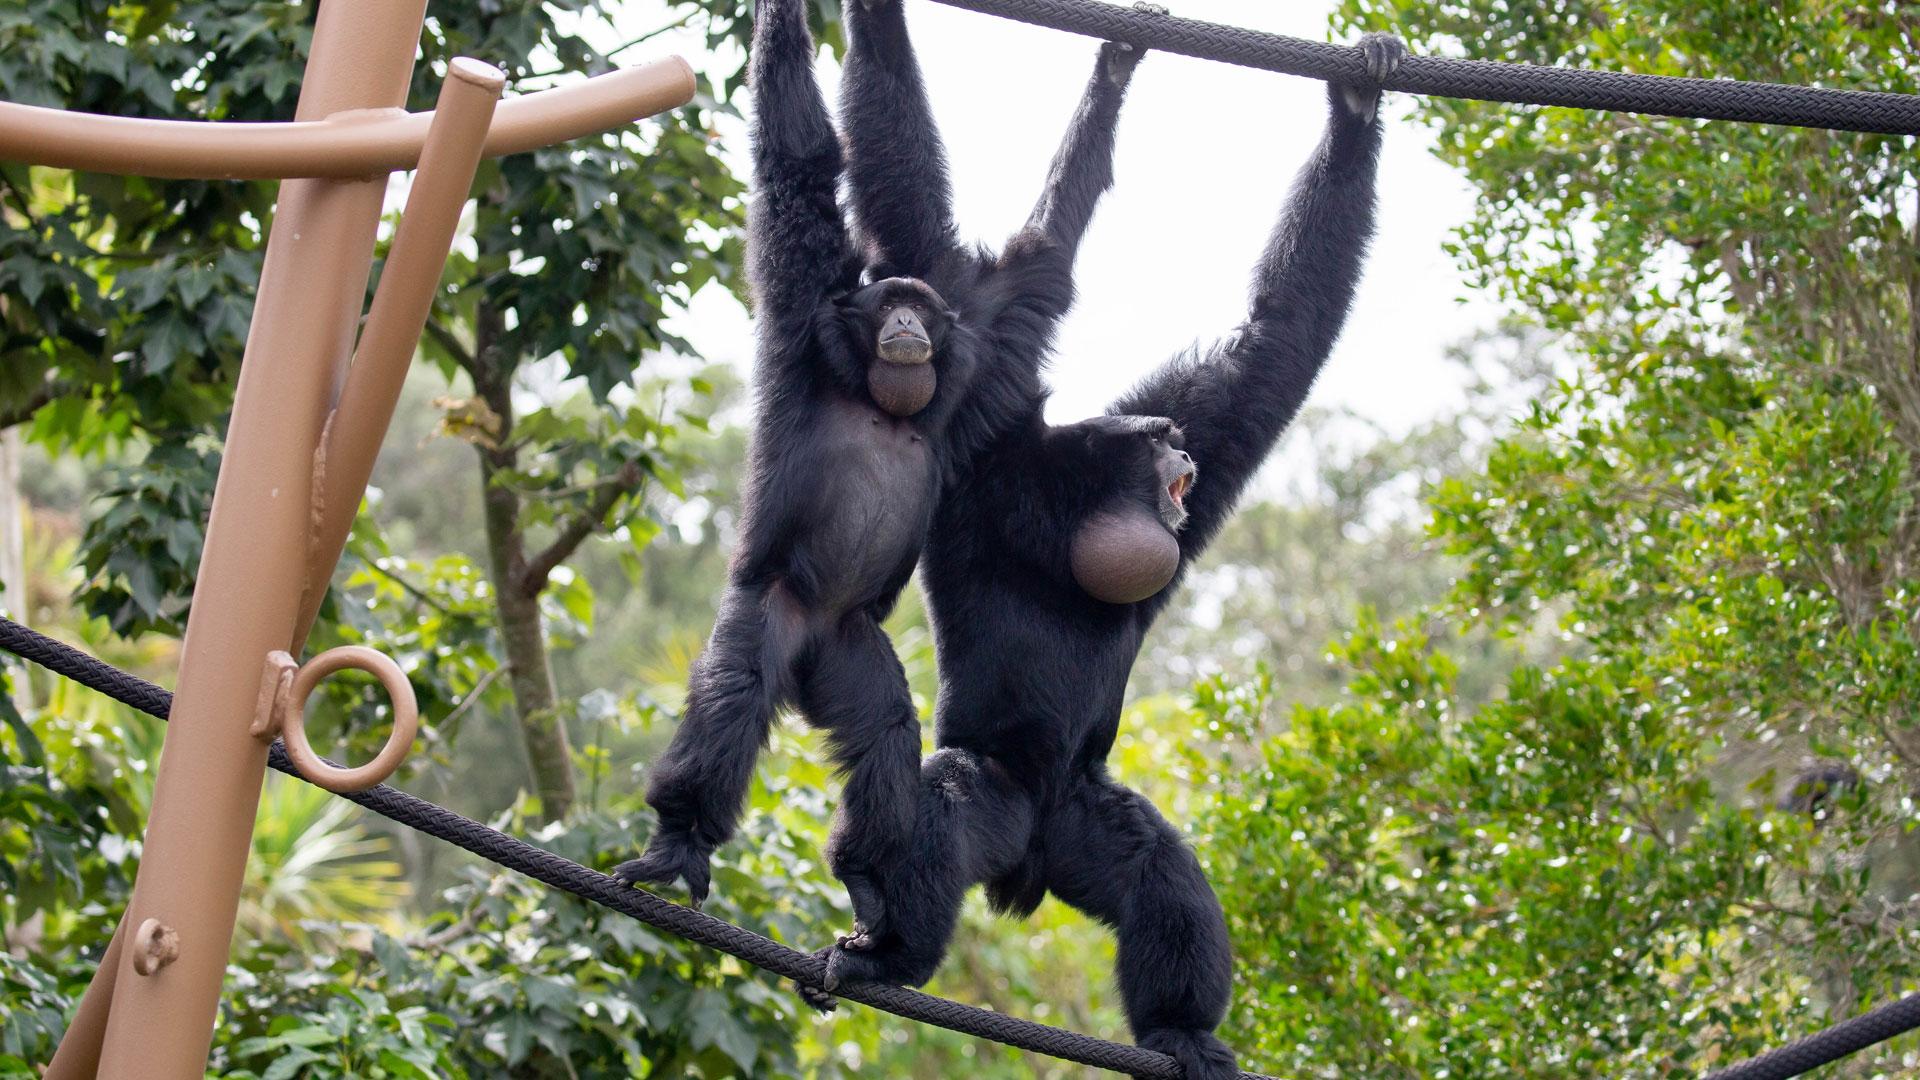 https://rfacdn.nz/zoo/assets/media/siamang-gibbon-gallery-1.jpg